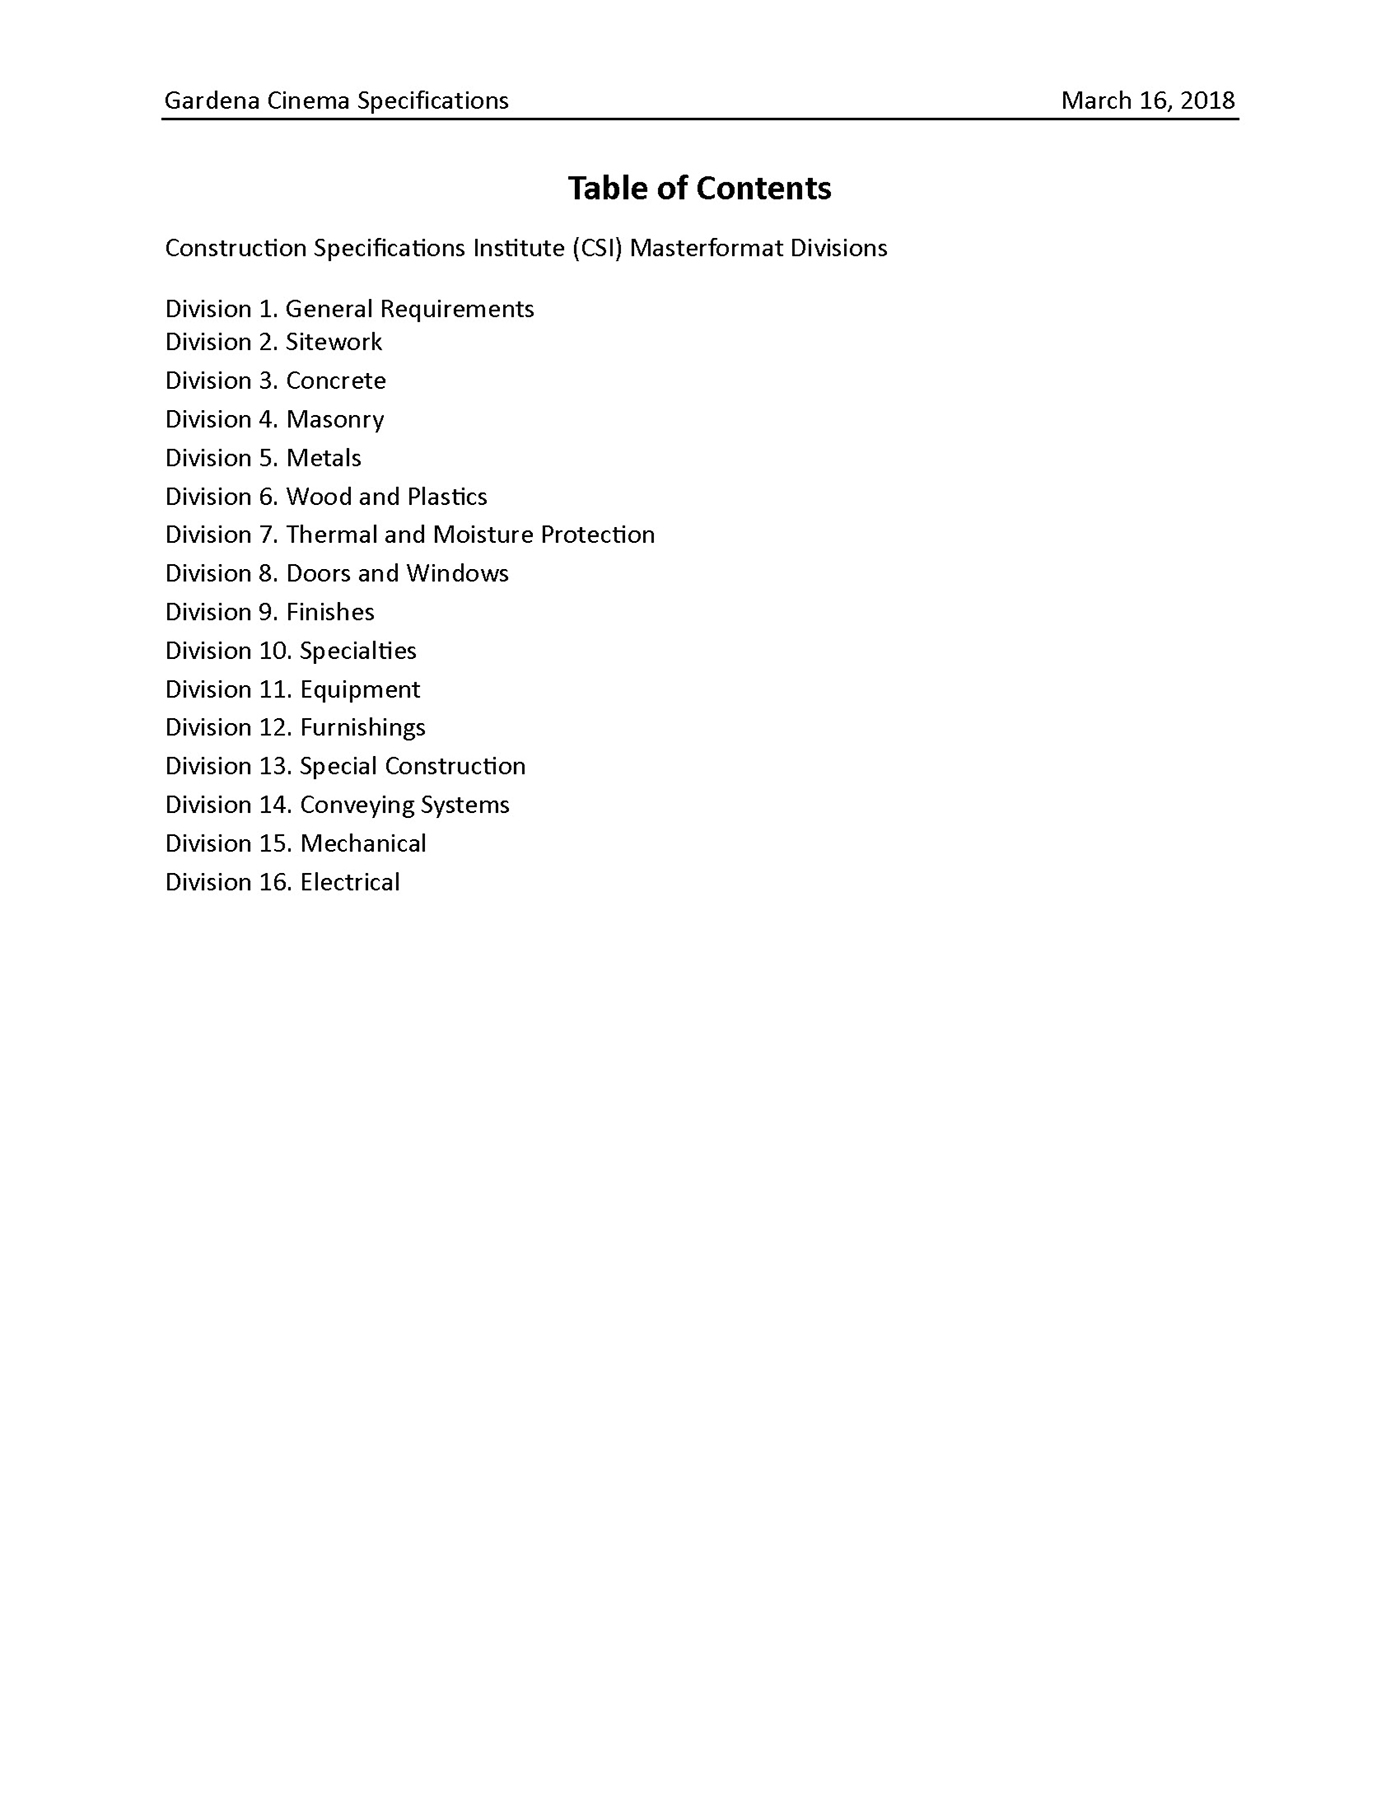 INTA432 Construction Documents II On Behance